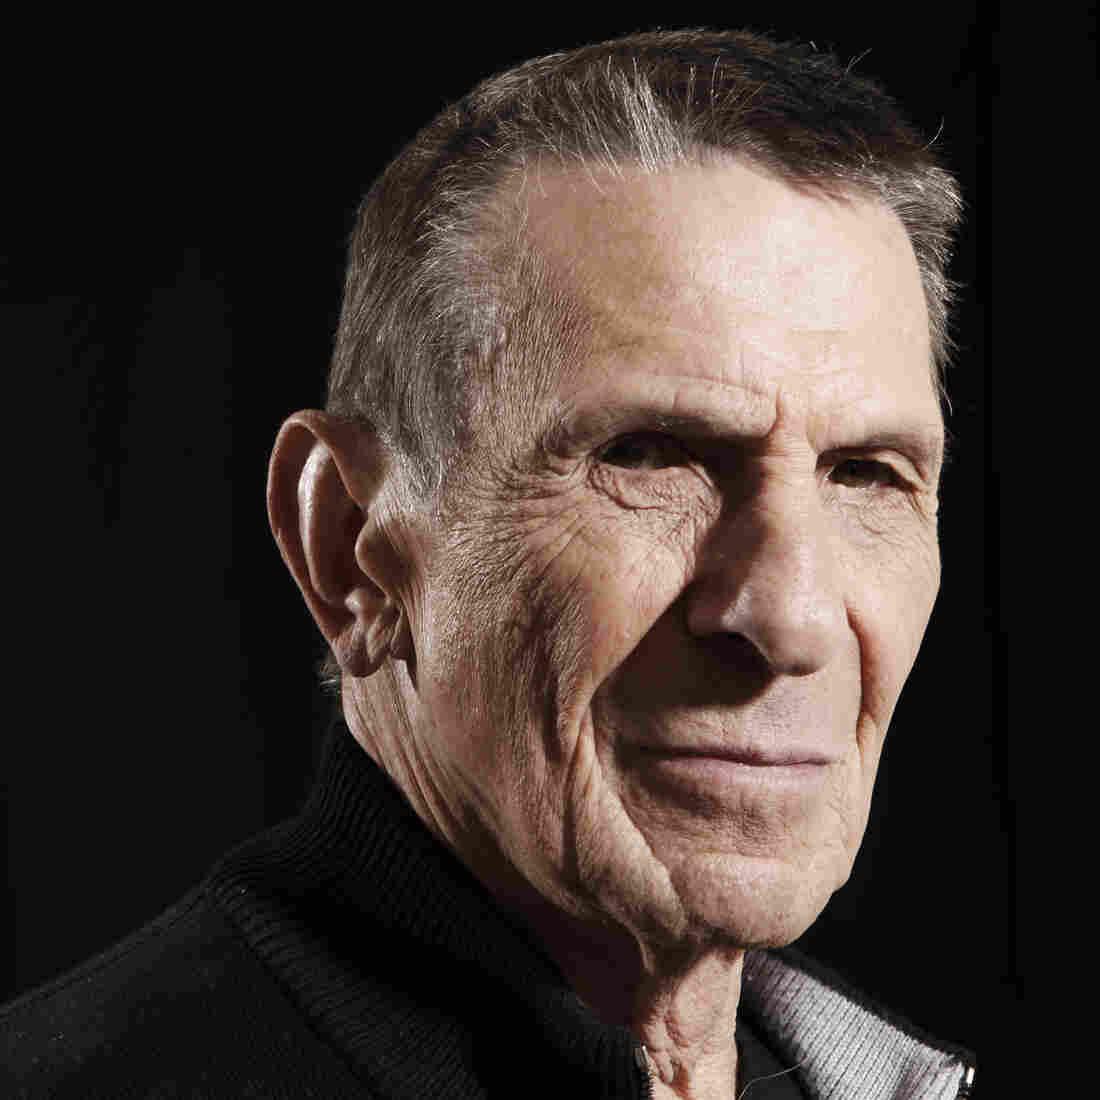 Leonard Nimoy, Mr. Spock On 'Star Trek,' Dies At 83